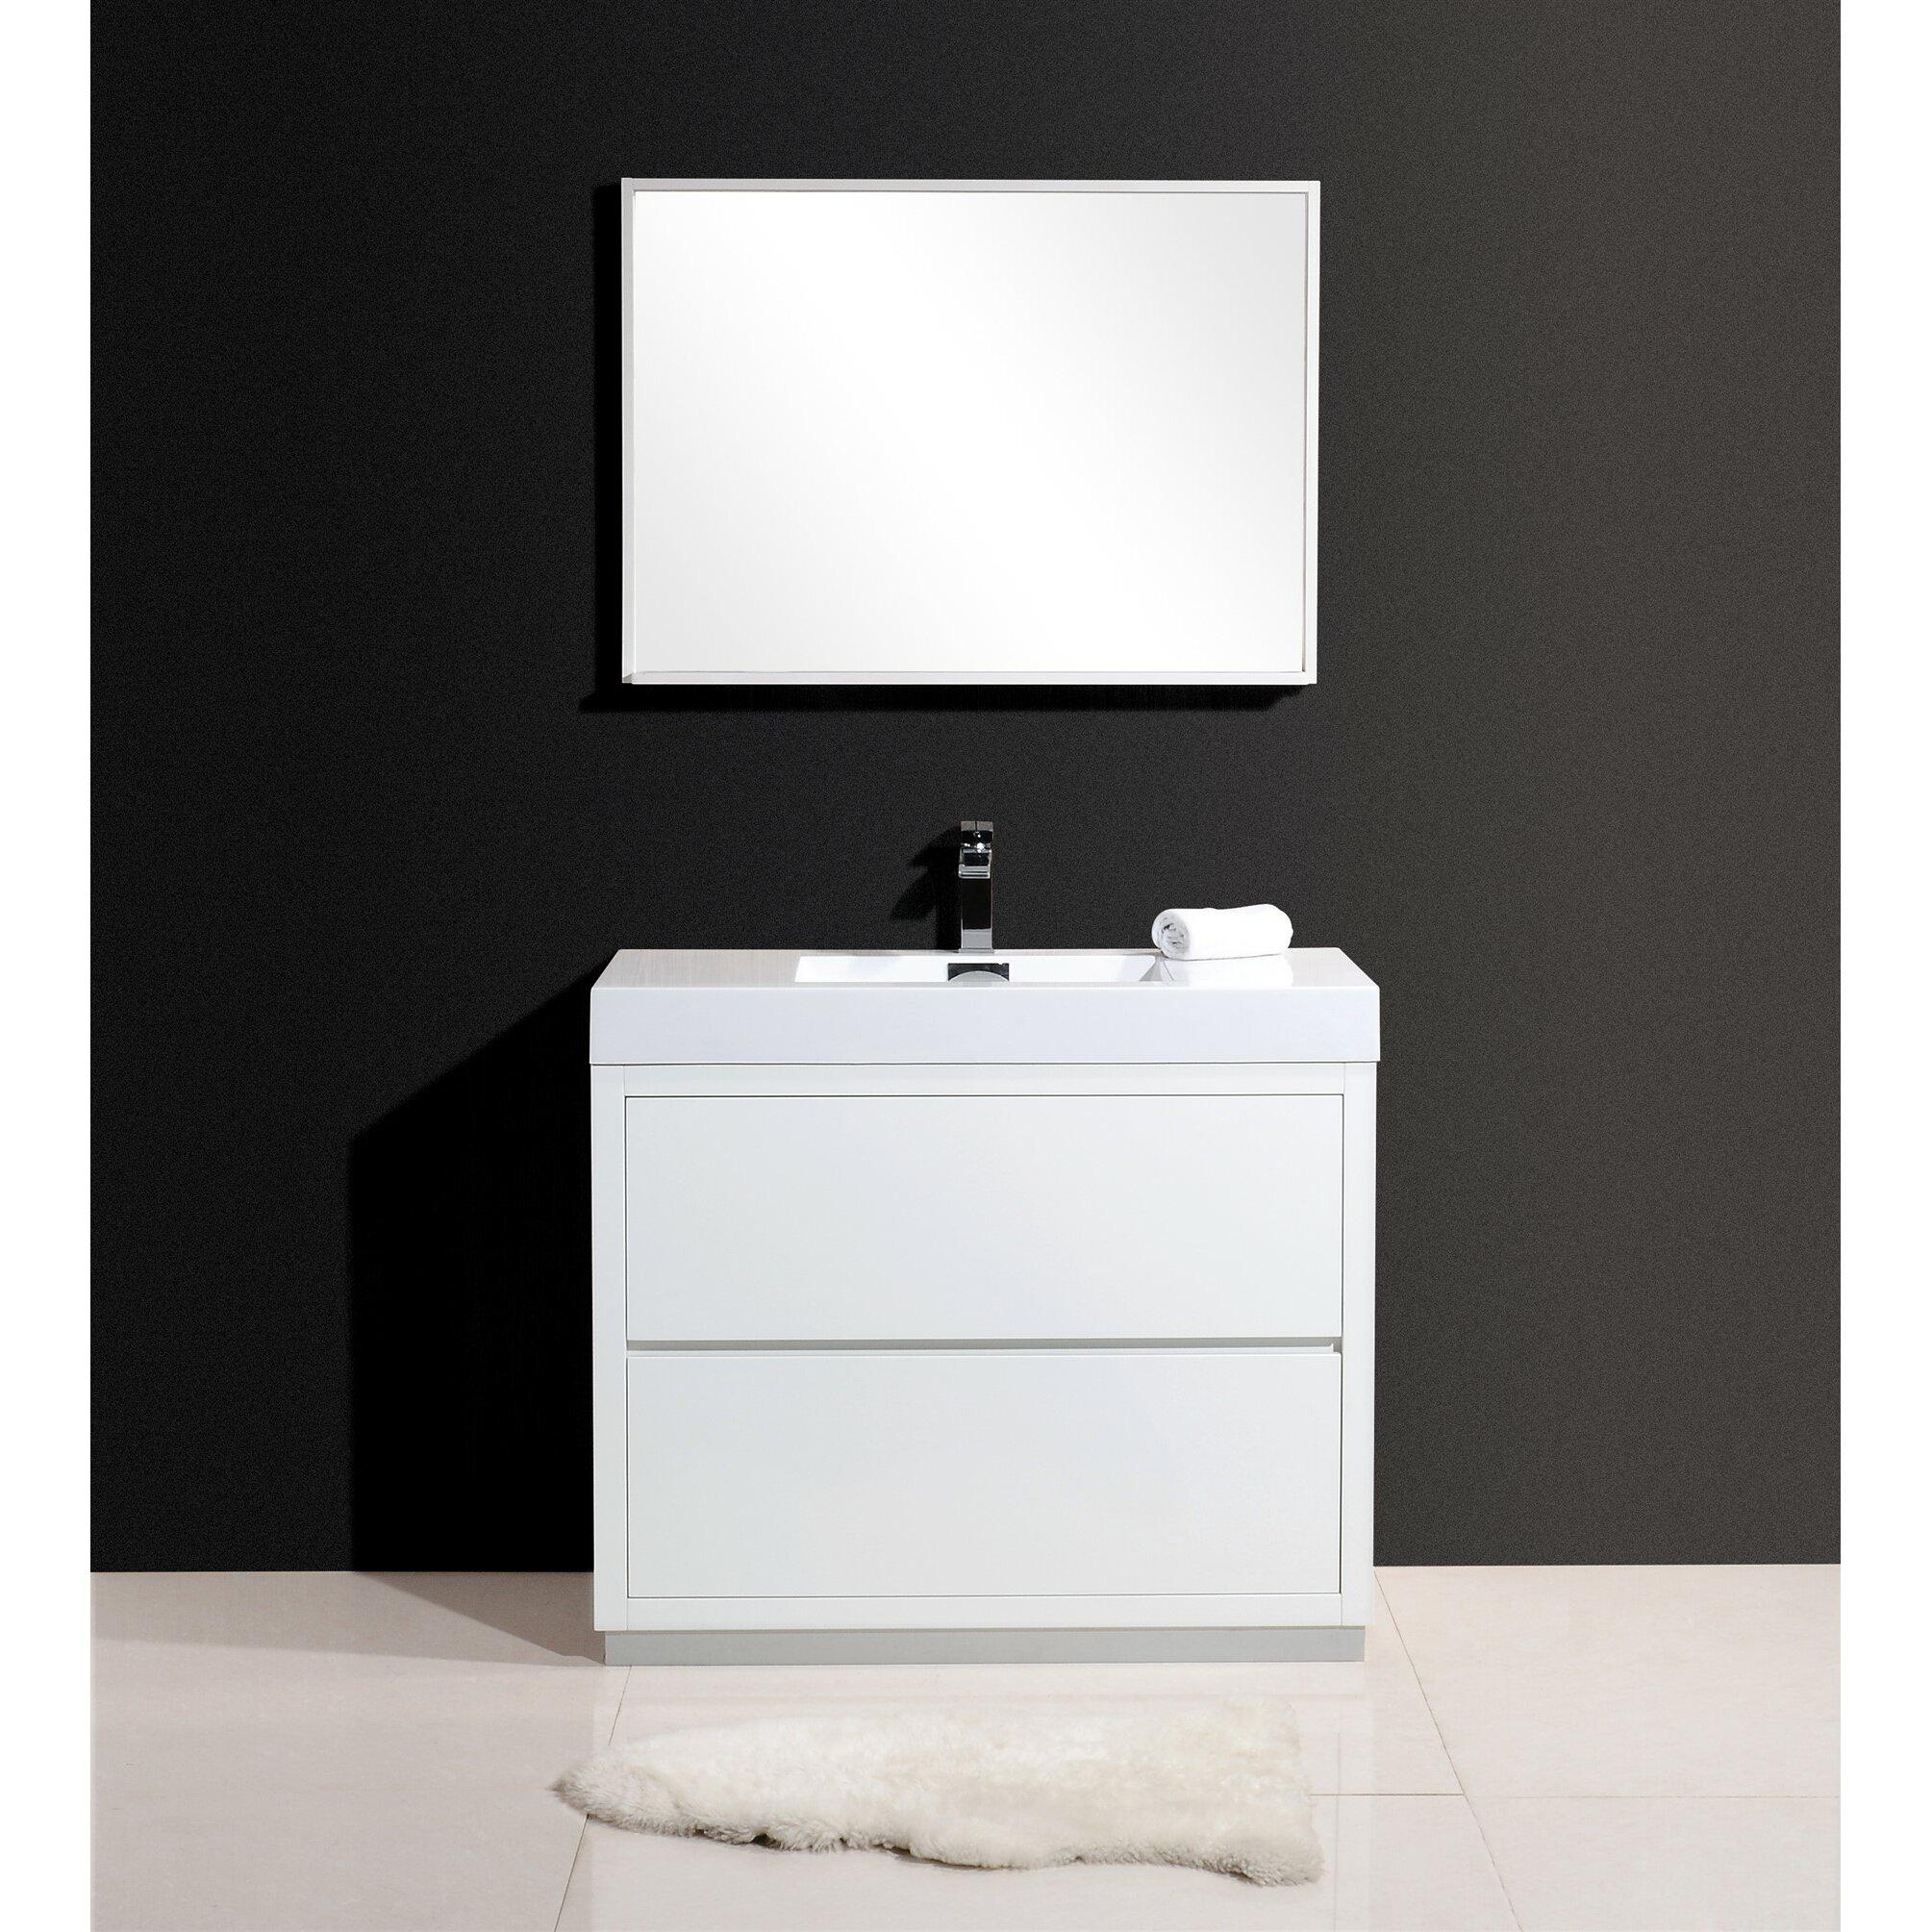 Kube bath bliss 40 single free standing modern bathroom vanity set reviews wayfair - Linden modern bathroom vanity set ...